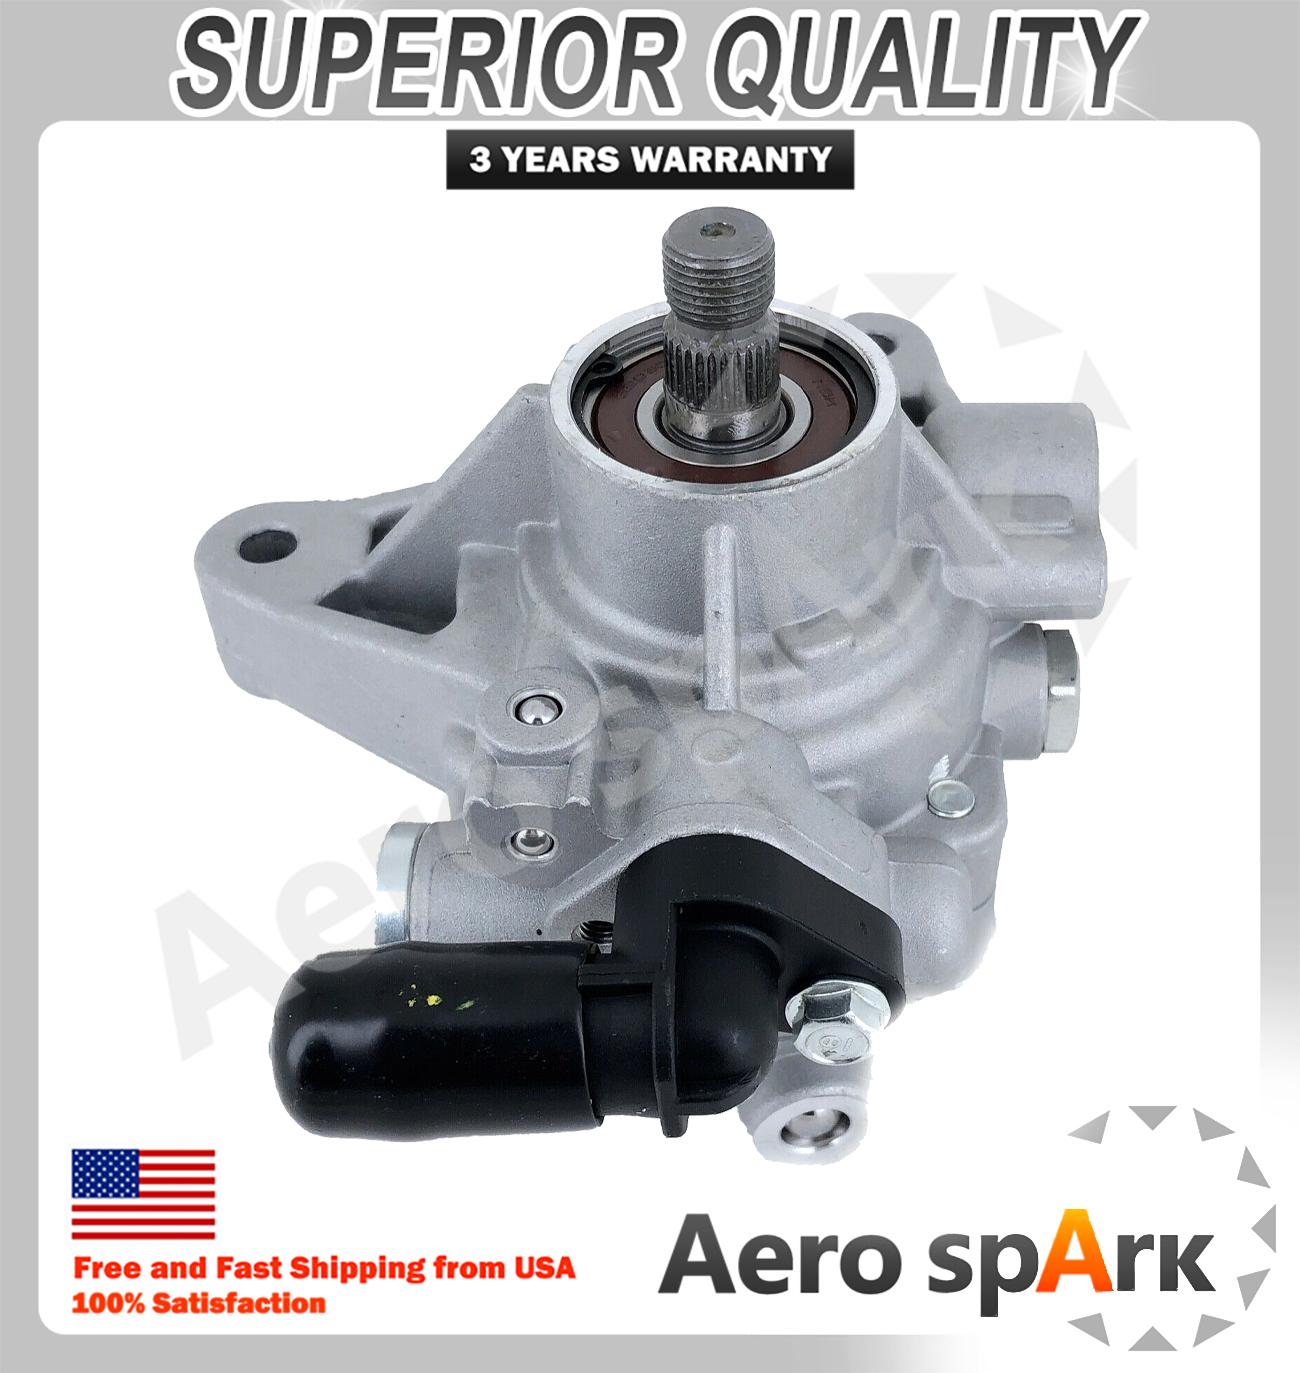 New Power Steering Pump For 04-05 ACURA TSX/03-05 HONDA